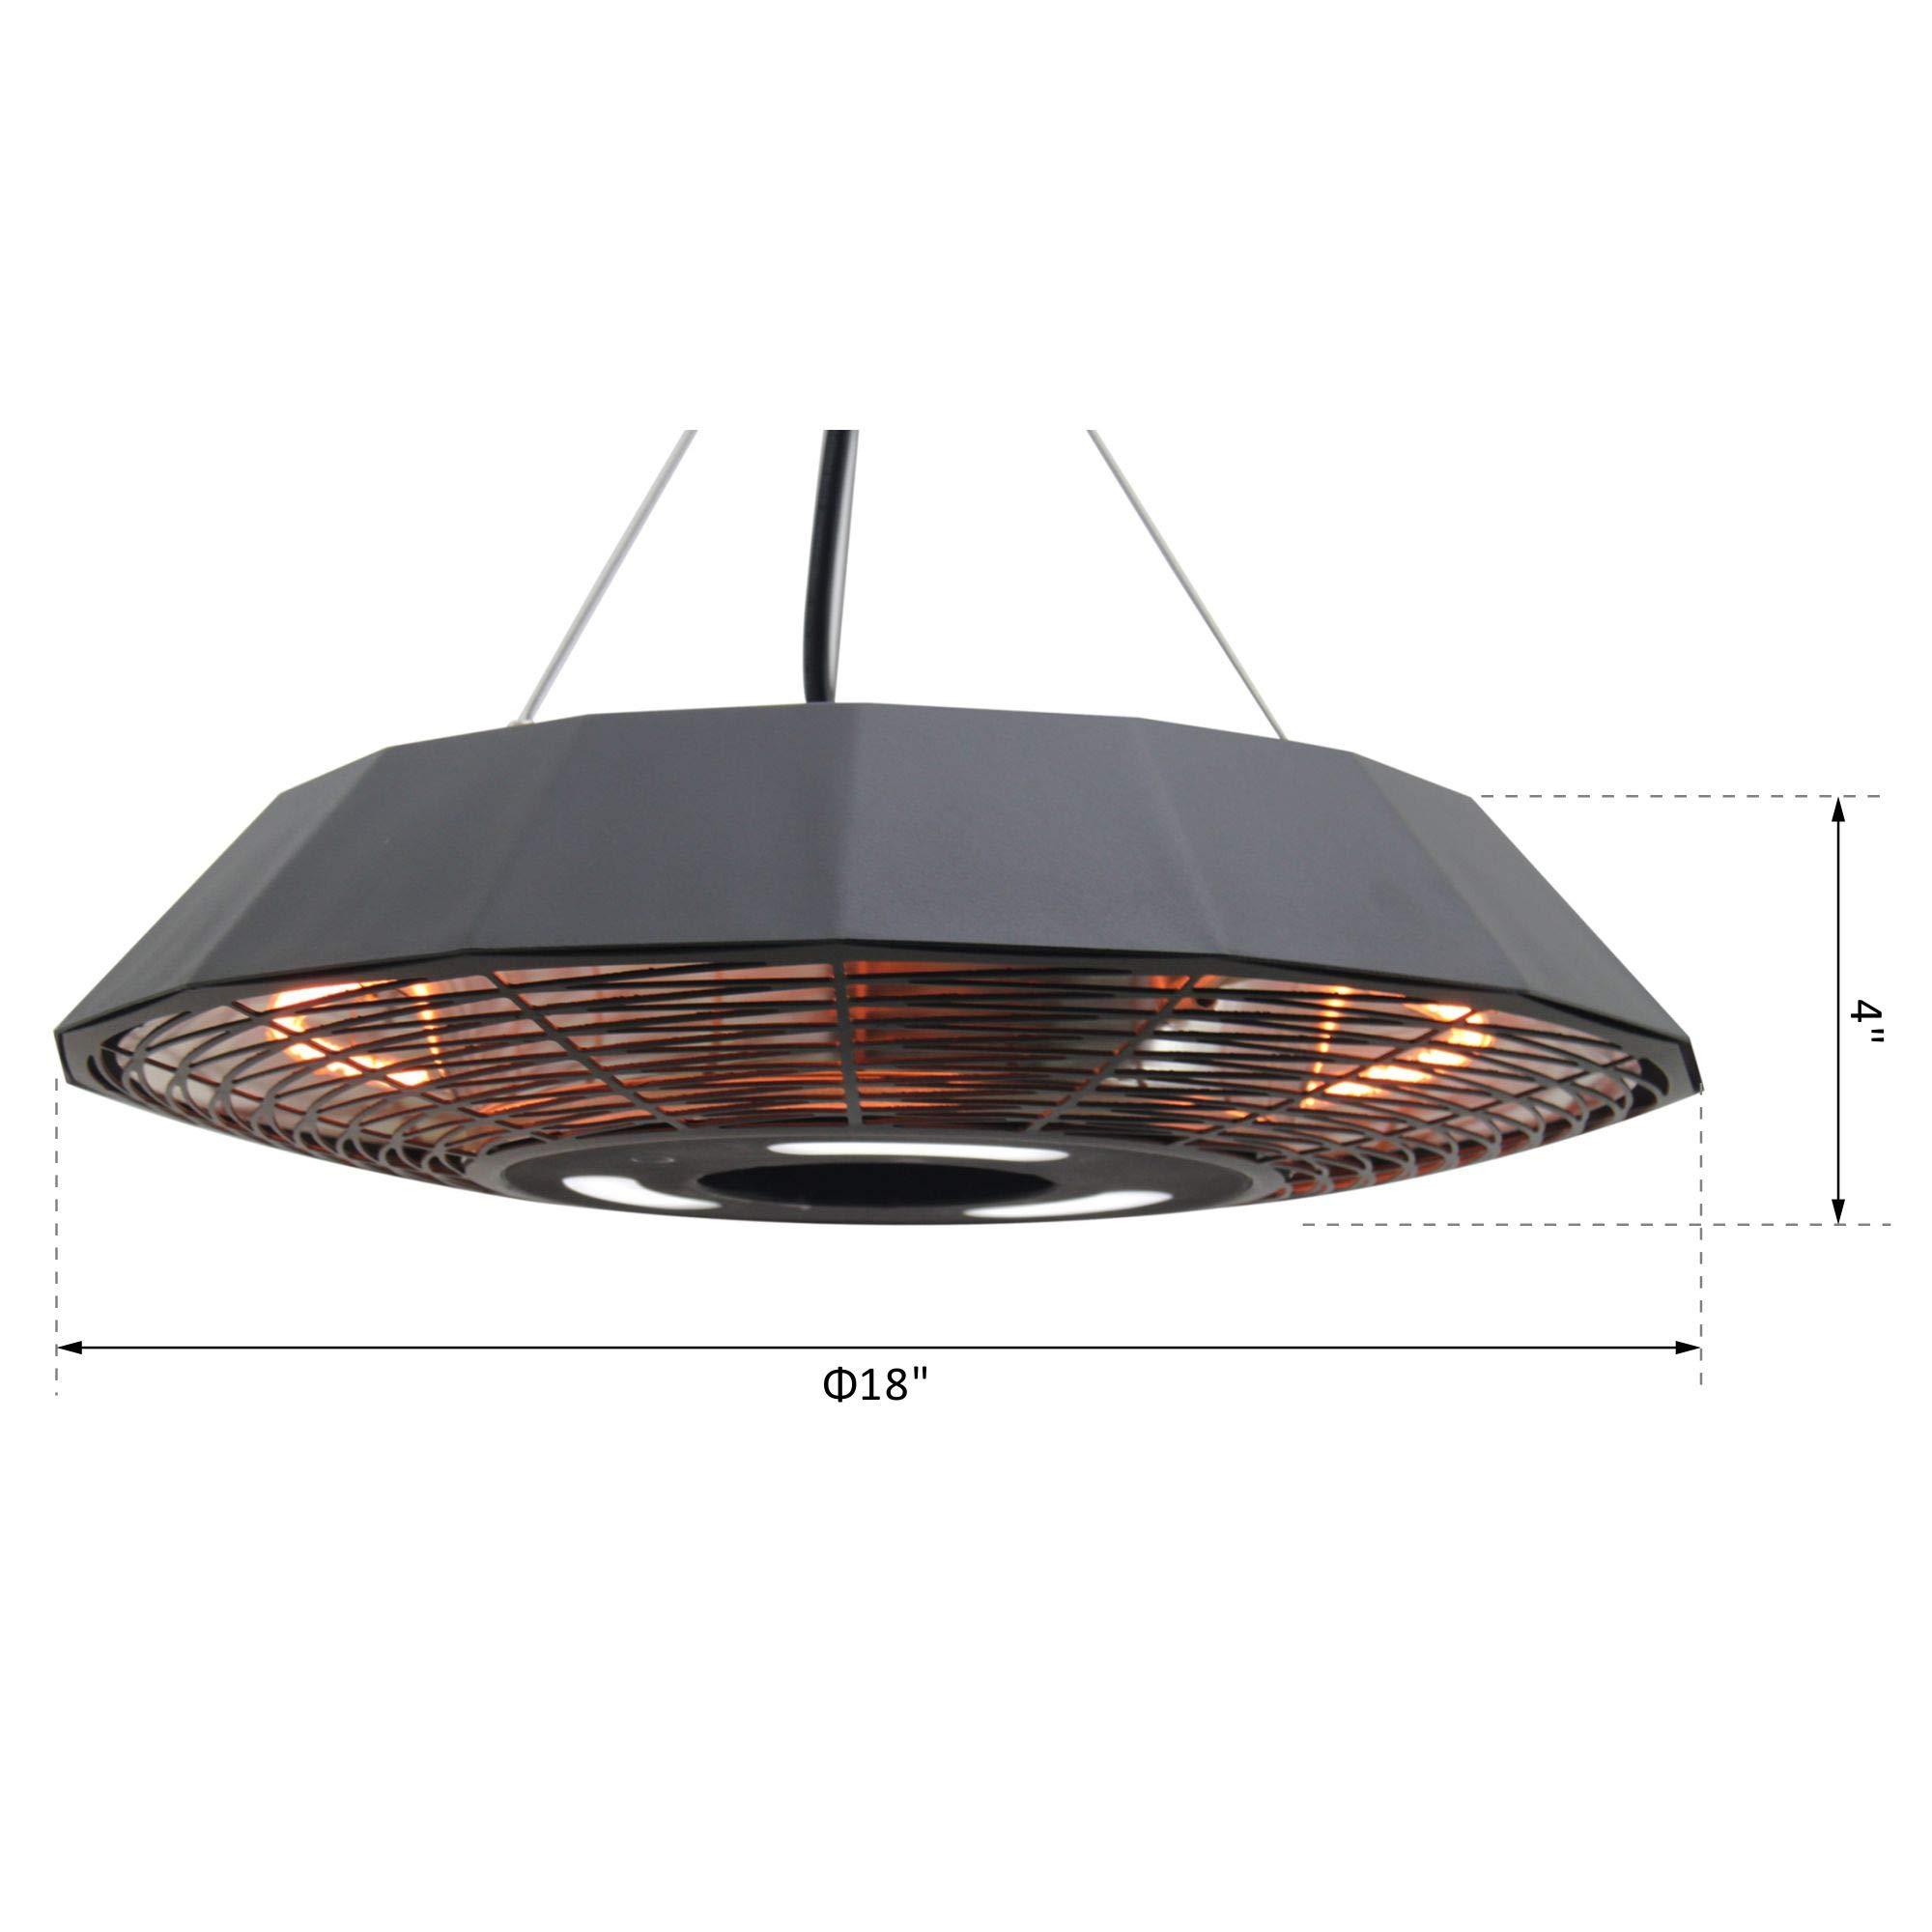 Outsunny 18u2033 1500 Watt Indoor Outdoor Ceiling Mounted Electric Patio Heater  ...